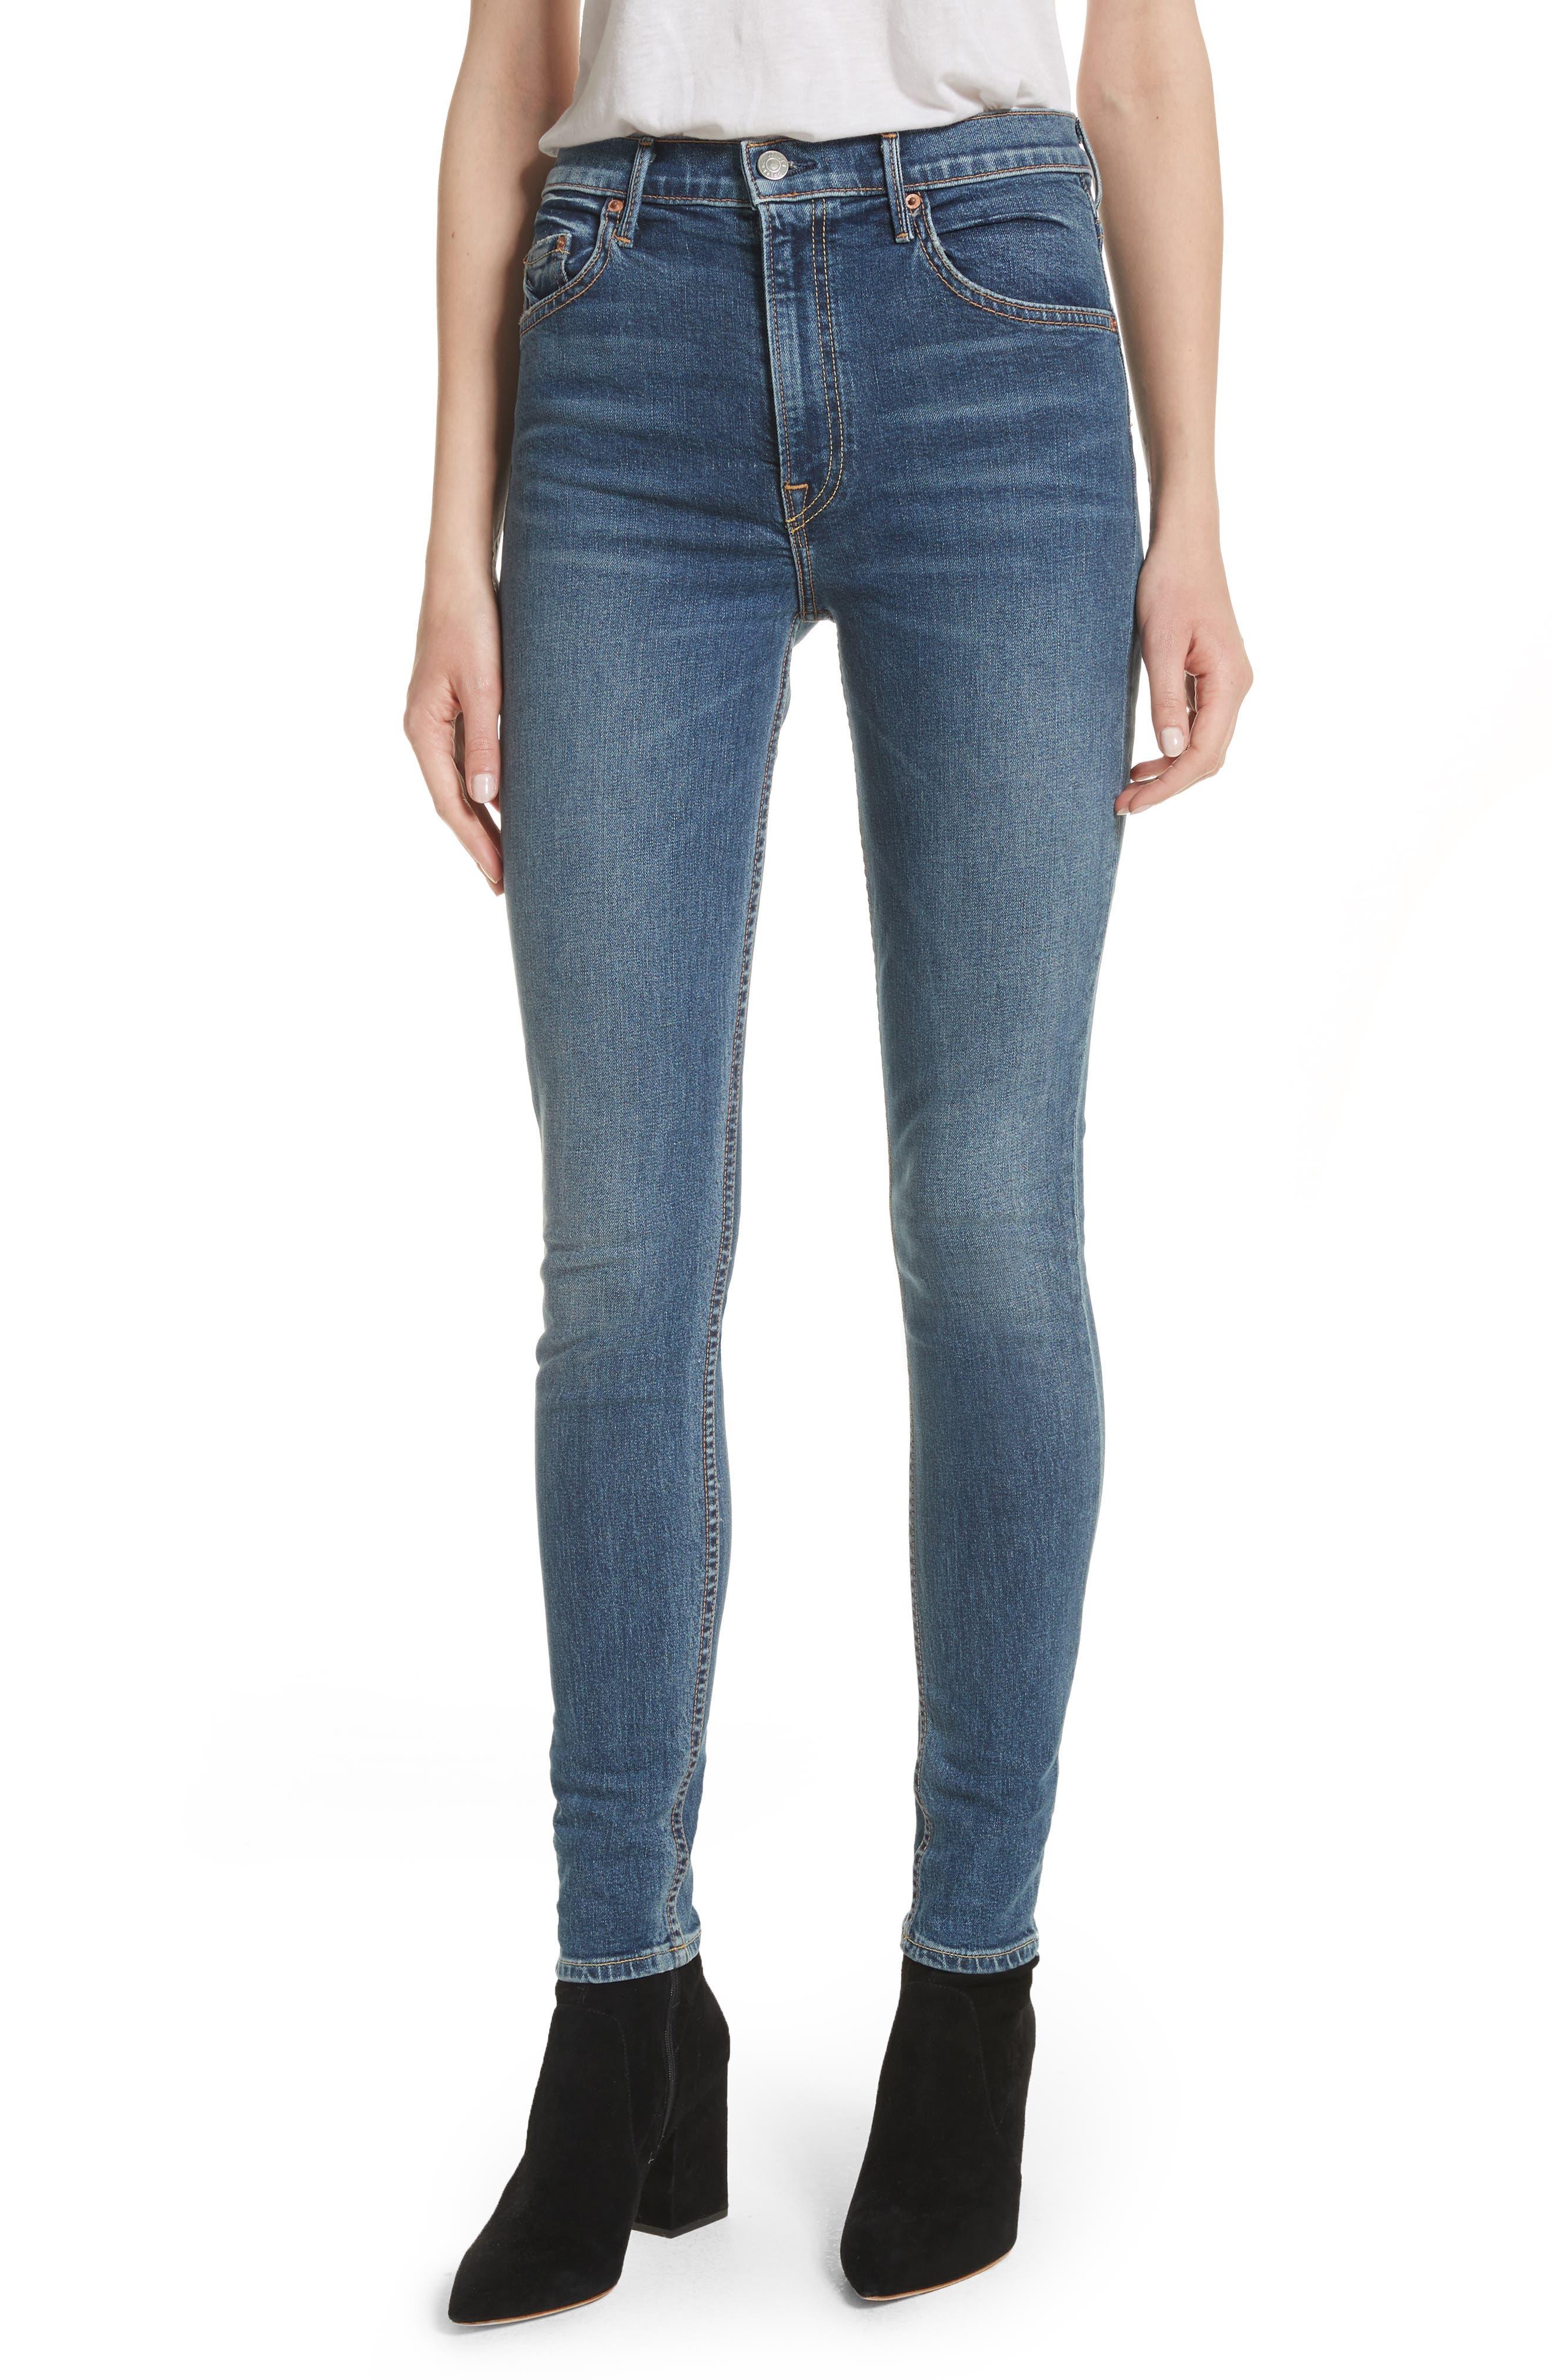 Main Image - GRLFRND Kendall Super Stretch High Waist Skinny Jeans (No More Tears)